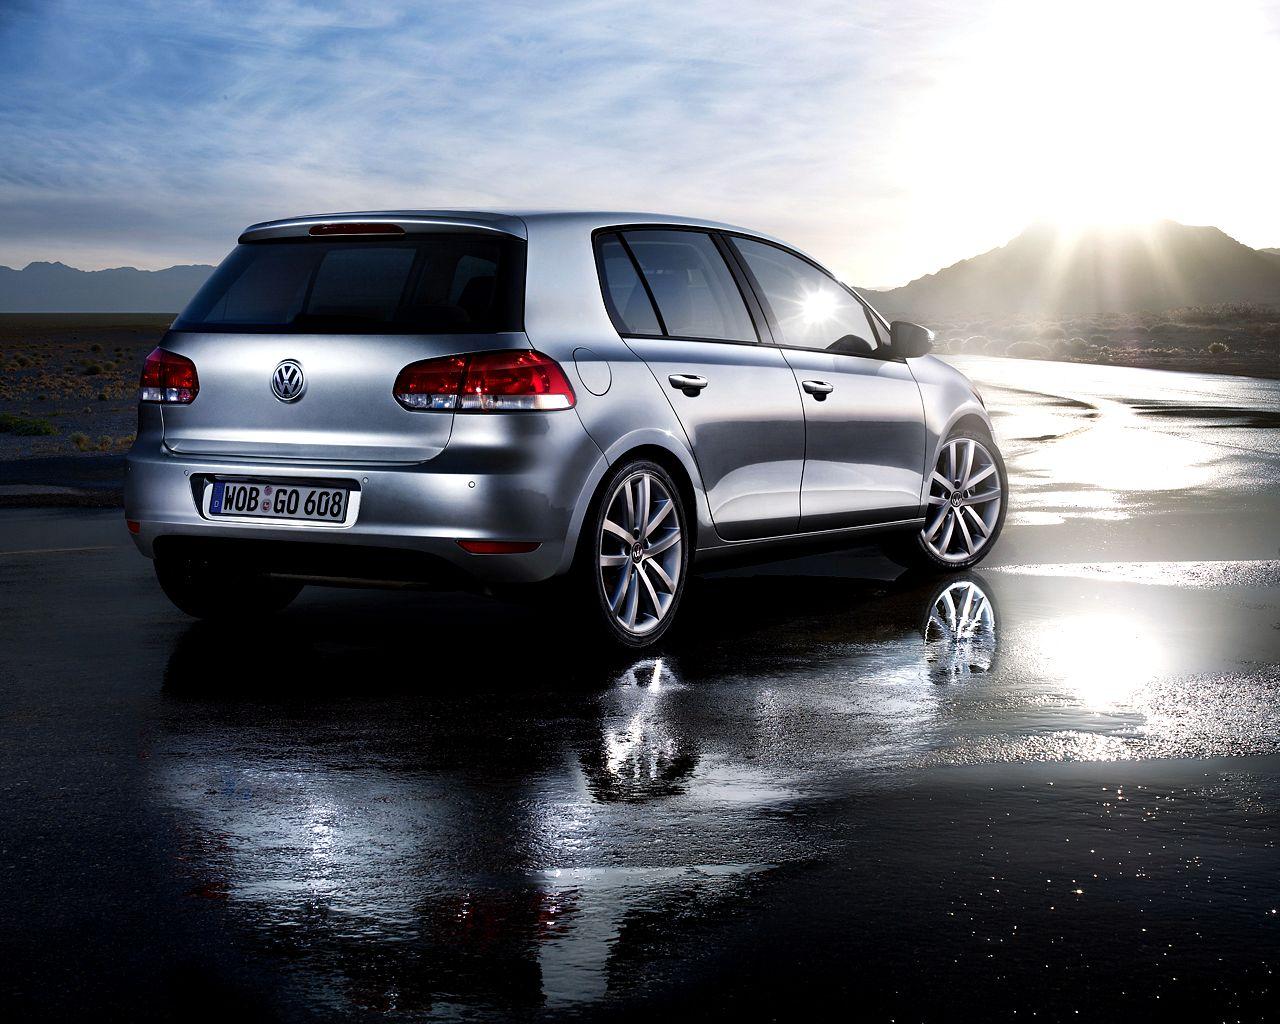 2013 Volkswagen Wallpapers   Vdub Newscom 1280x1024